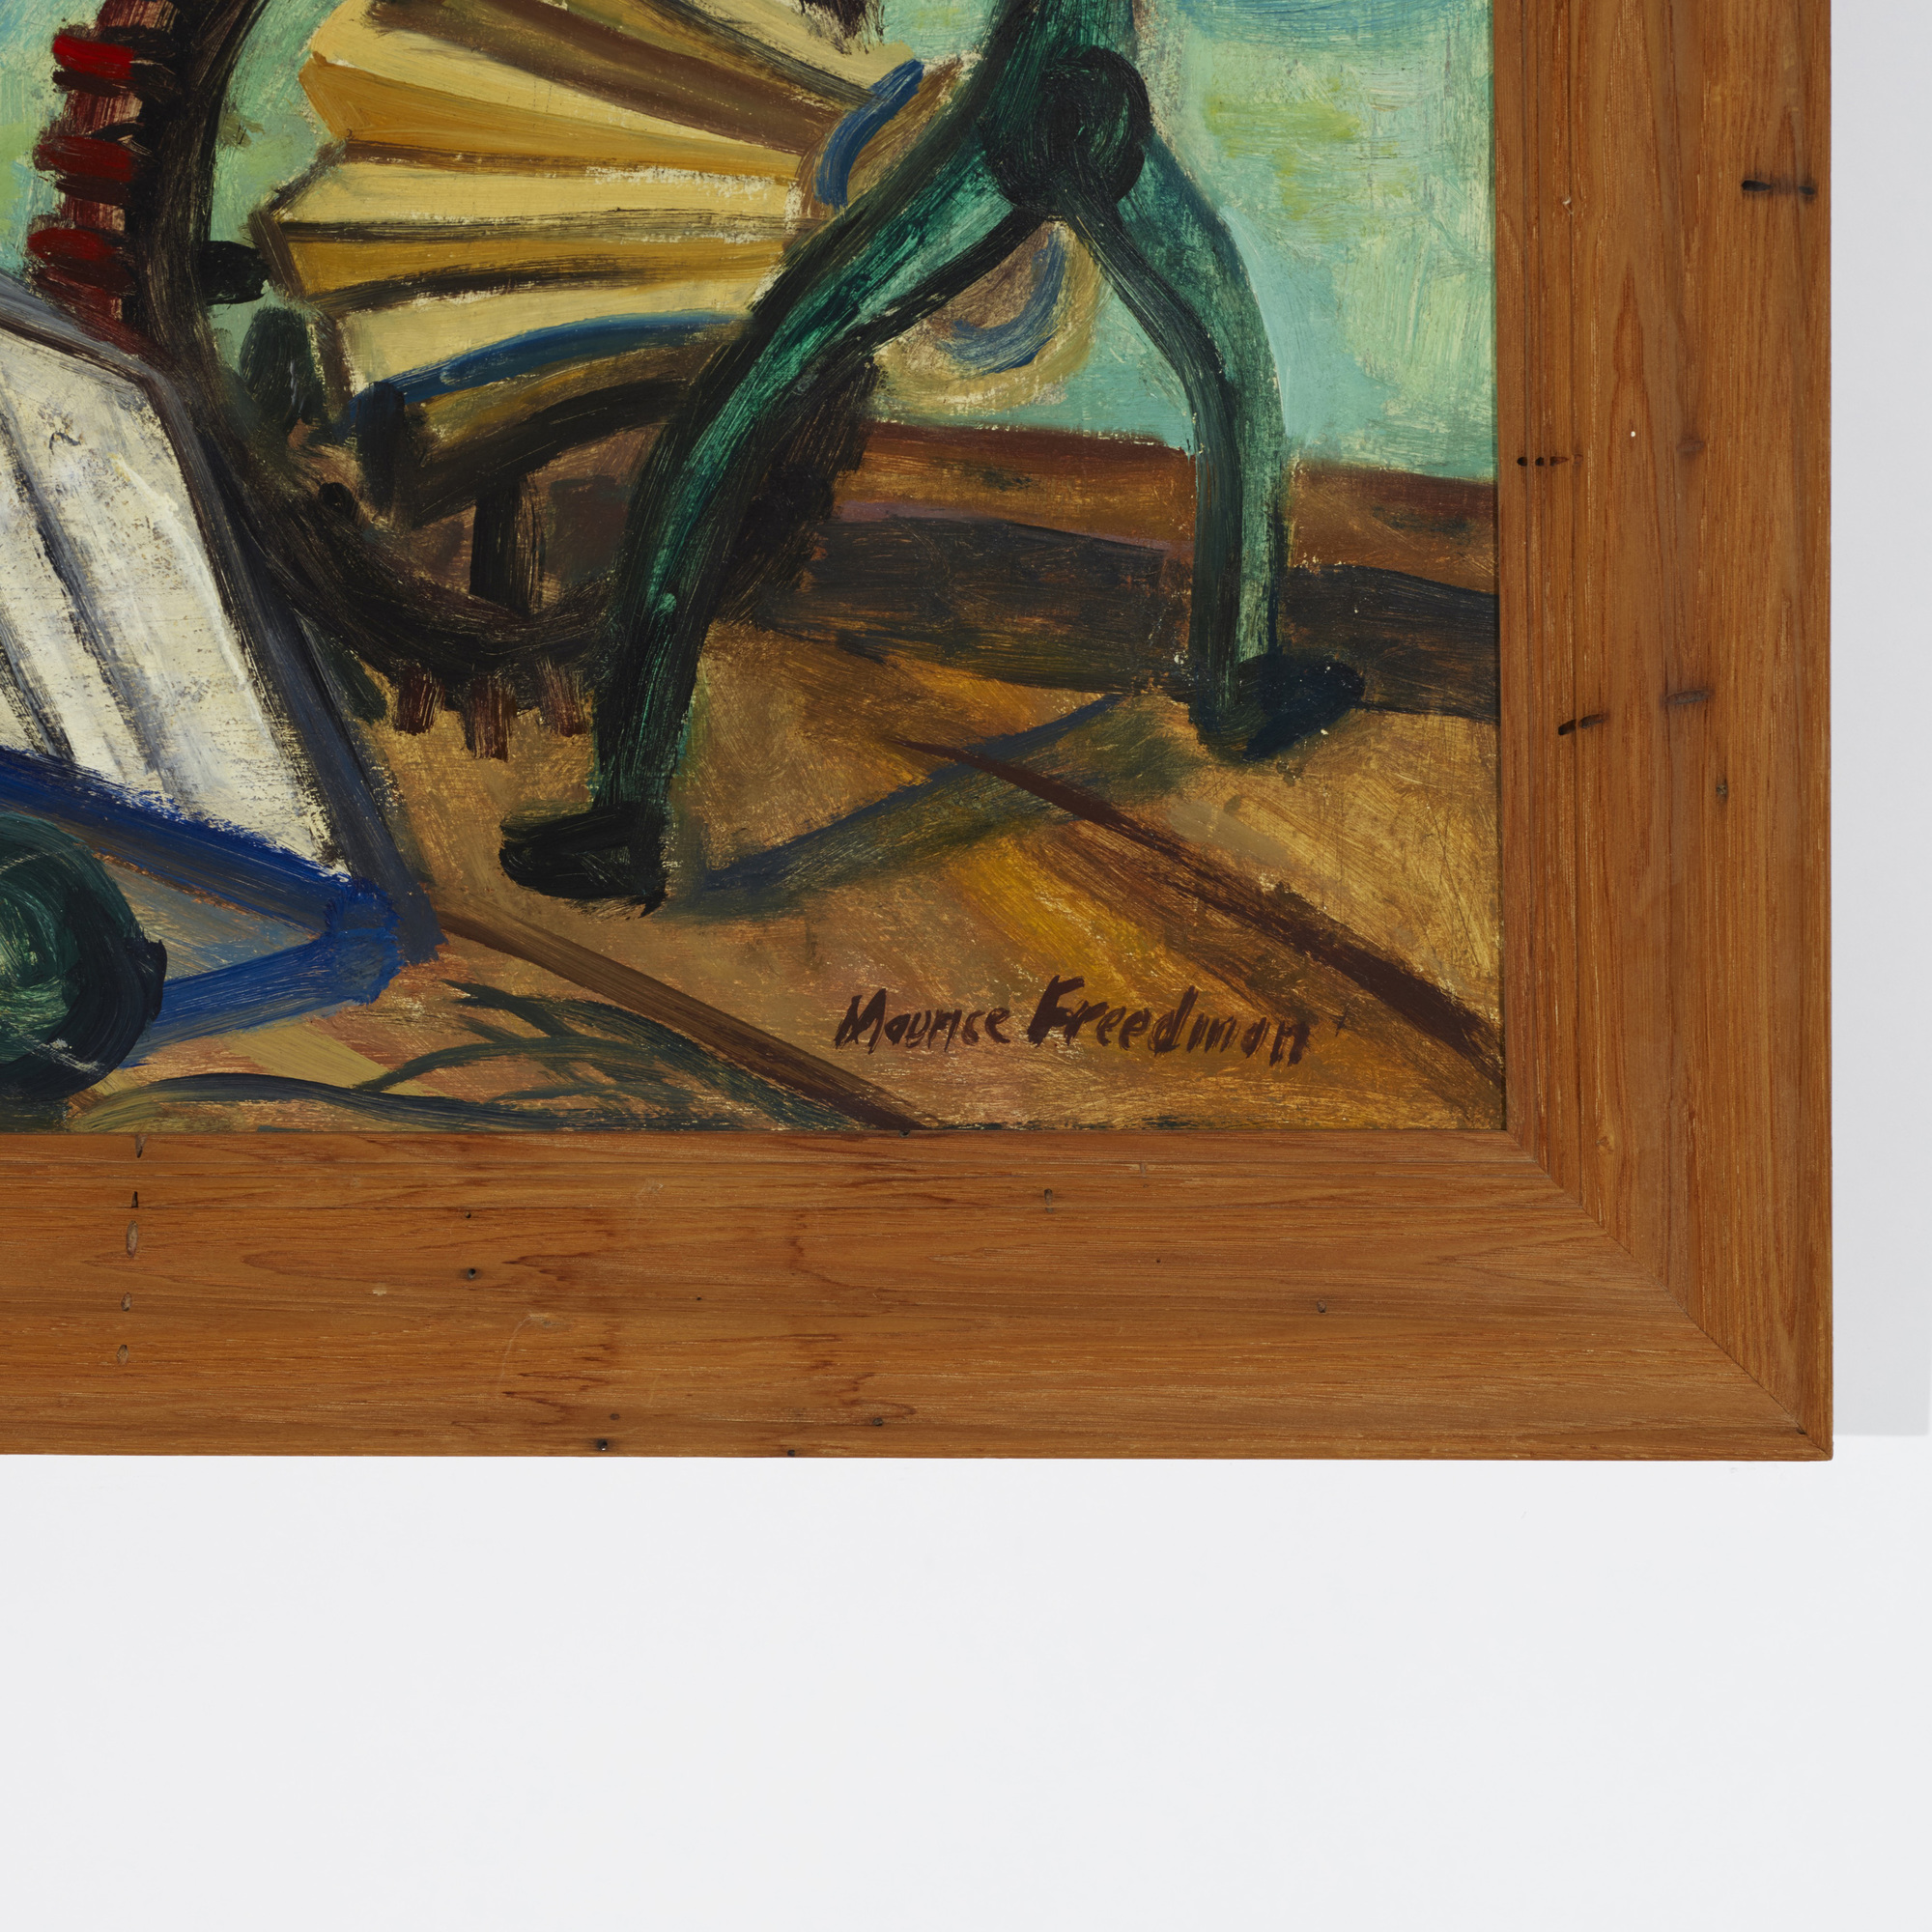 205: Maurice Freedman / Untitled (Harbor) (2 of 2)